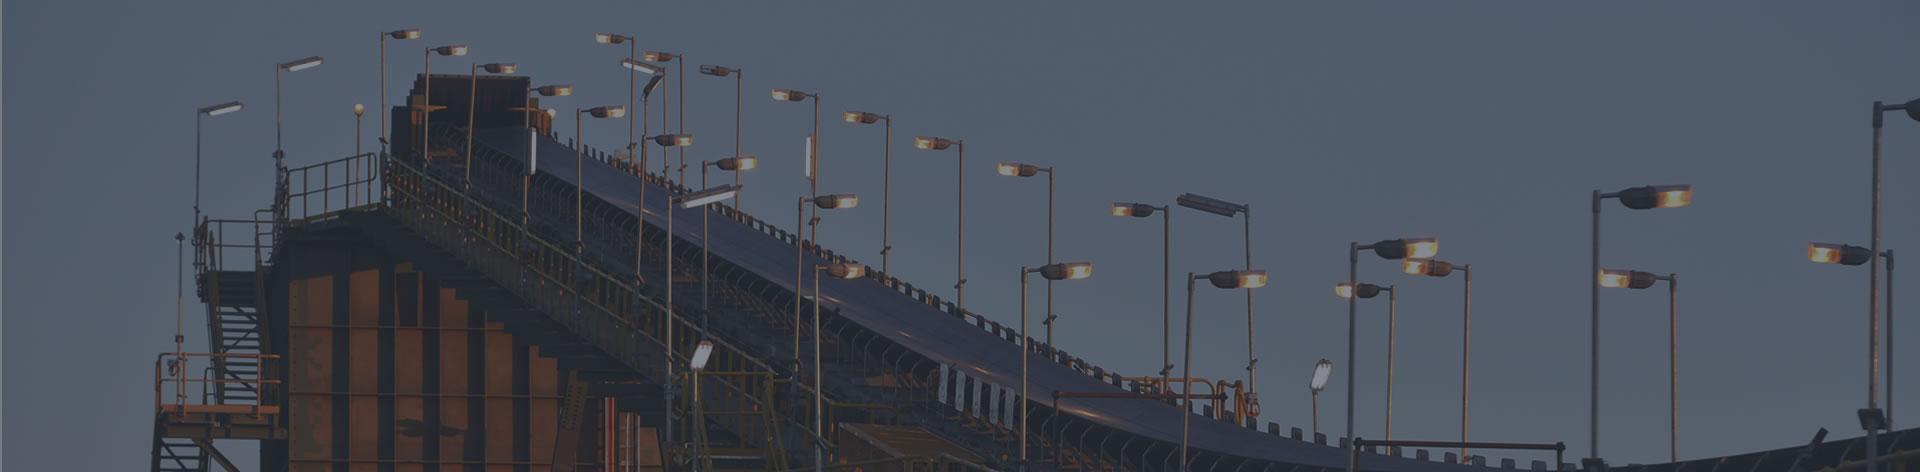 banner_engineering